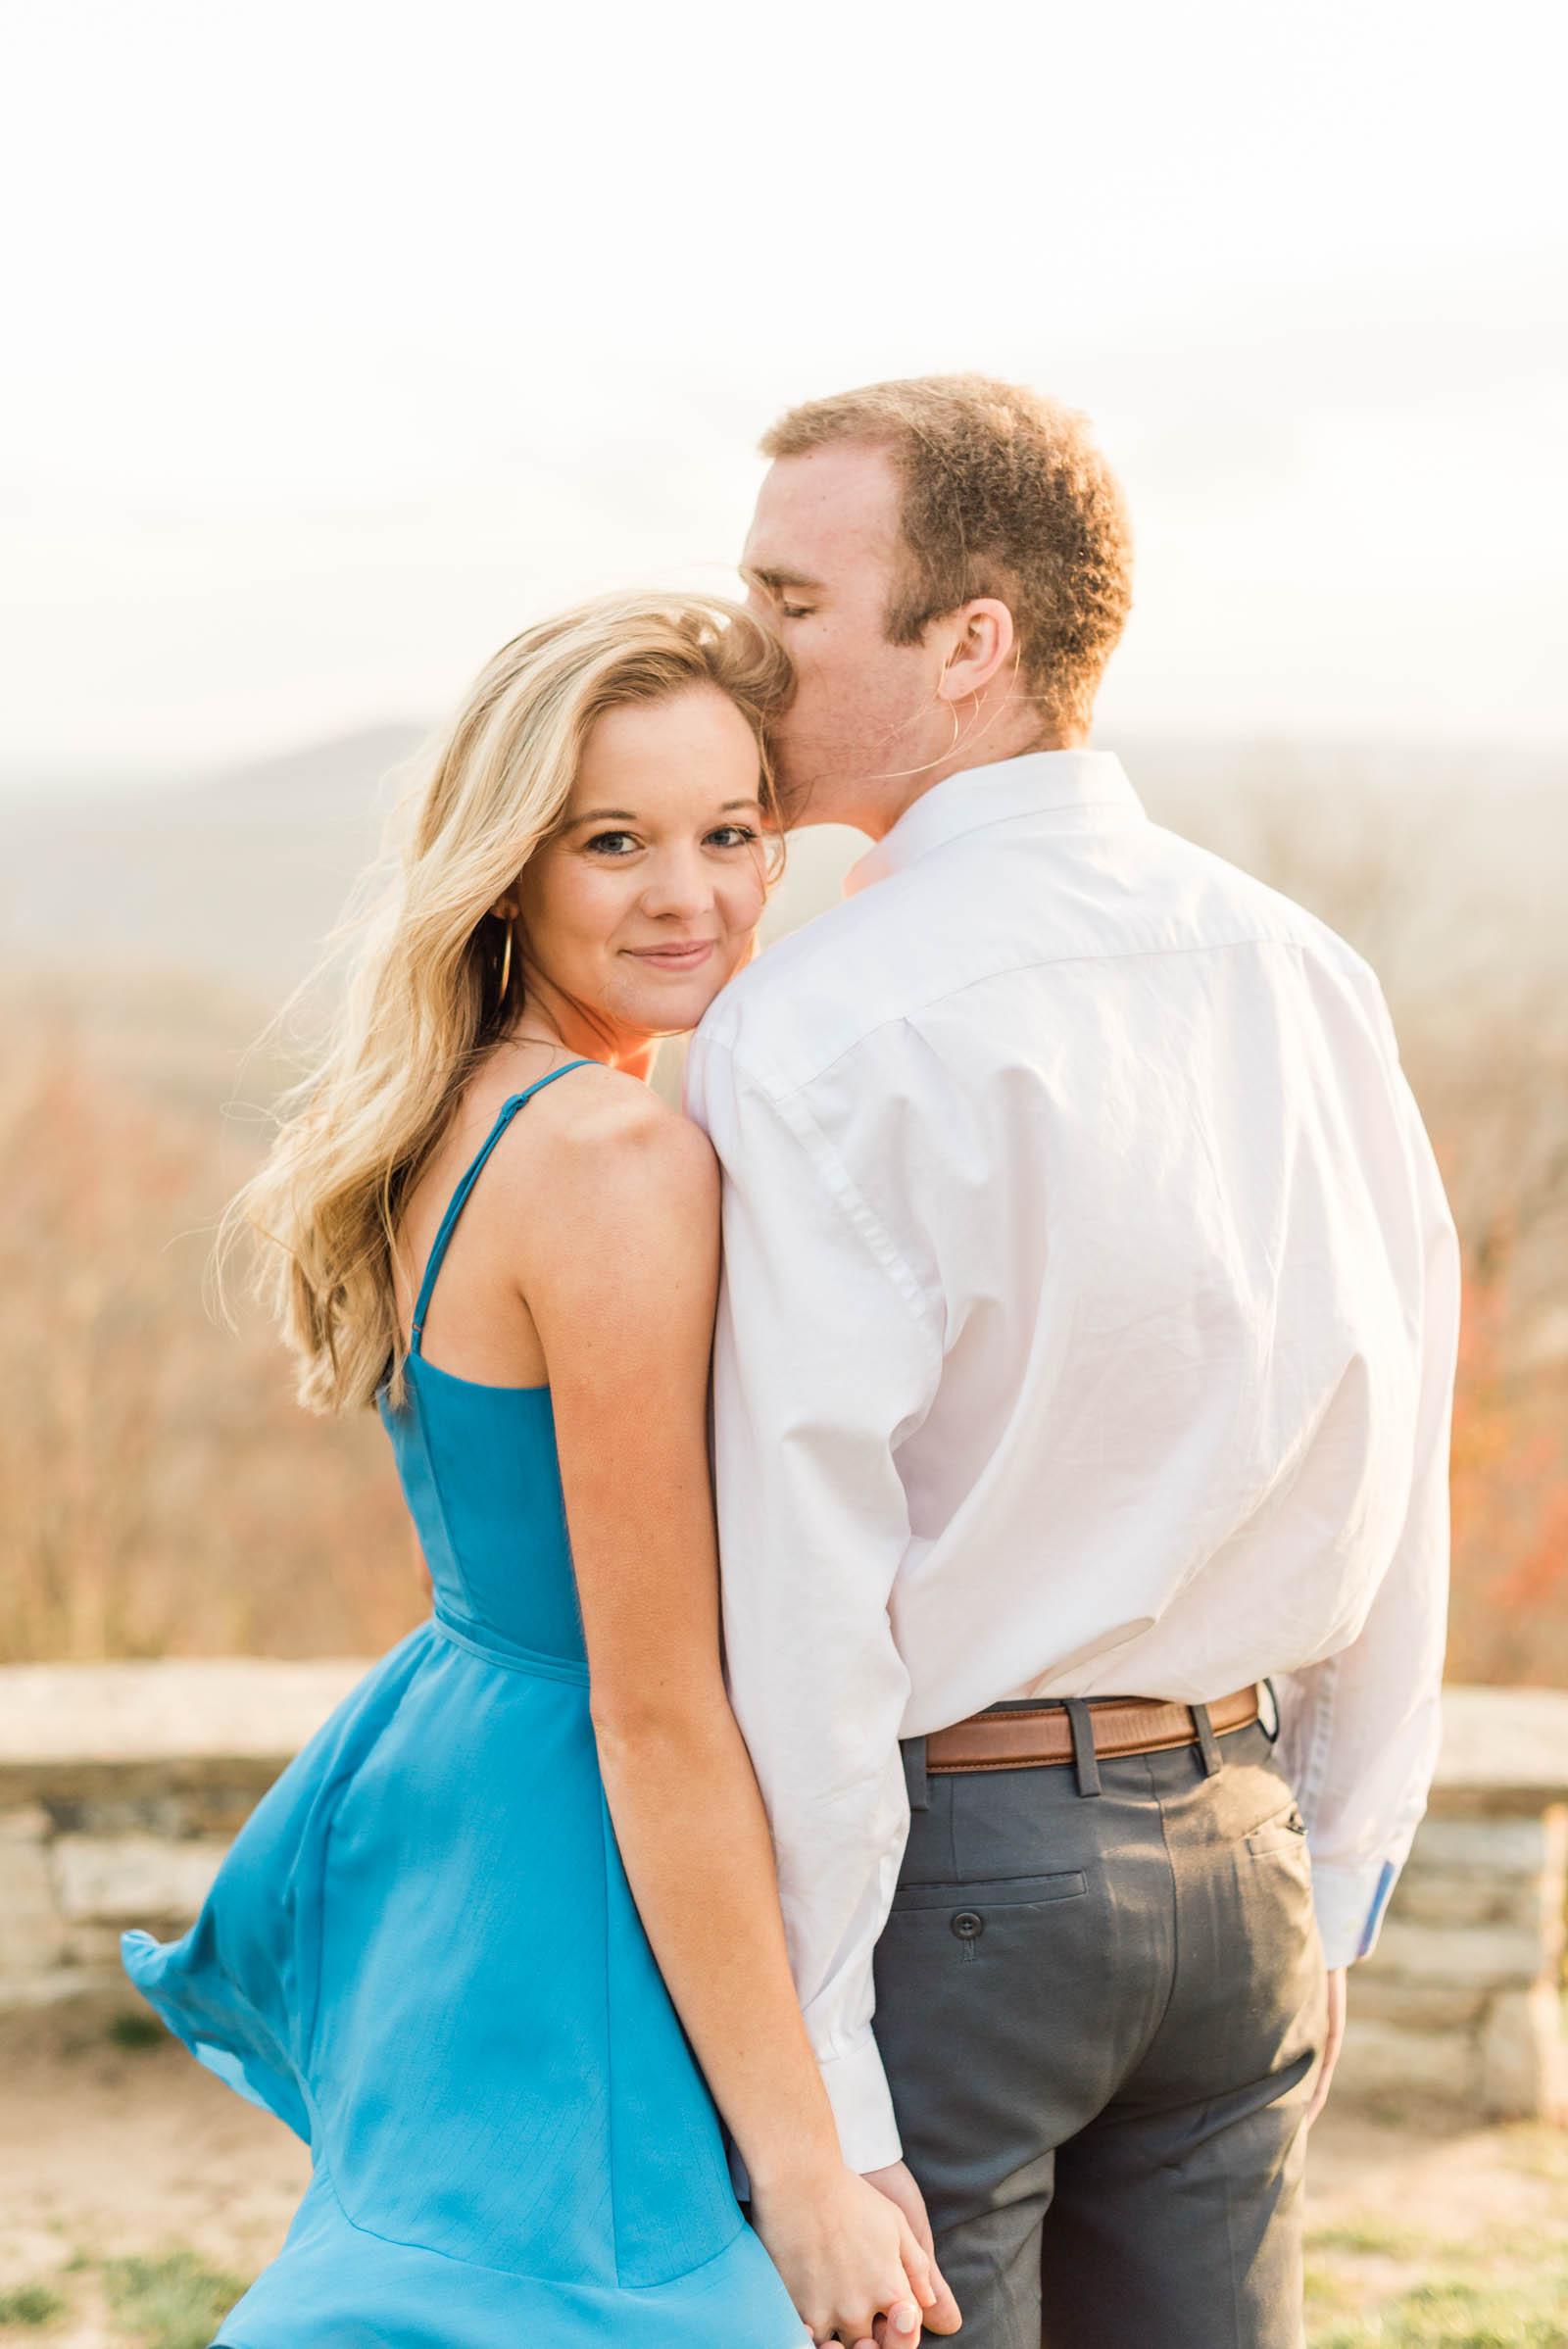 Sunset Mountain Engagement in North Carolina Morgan & Nathan Markie Walden Photography-17.jpg